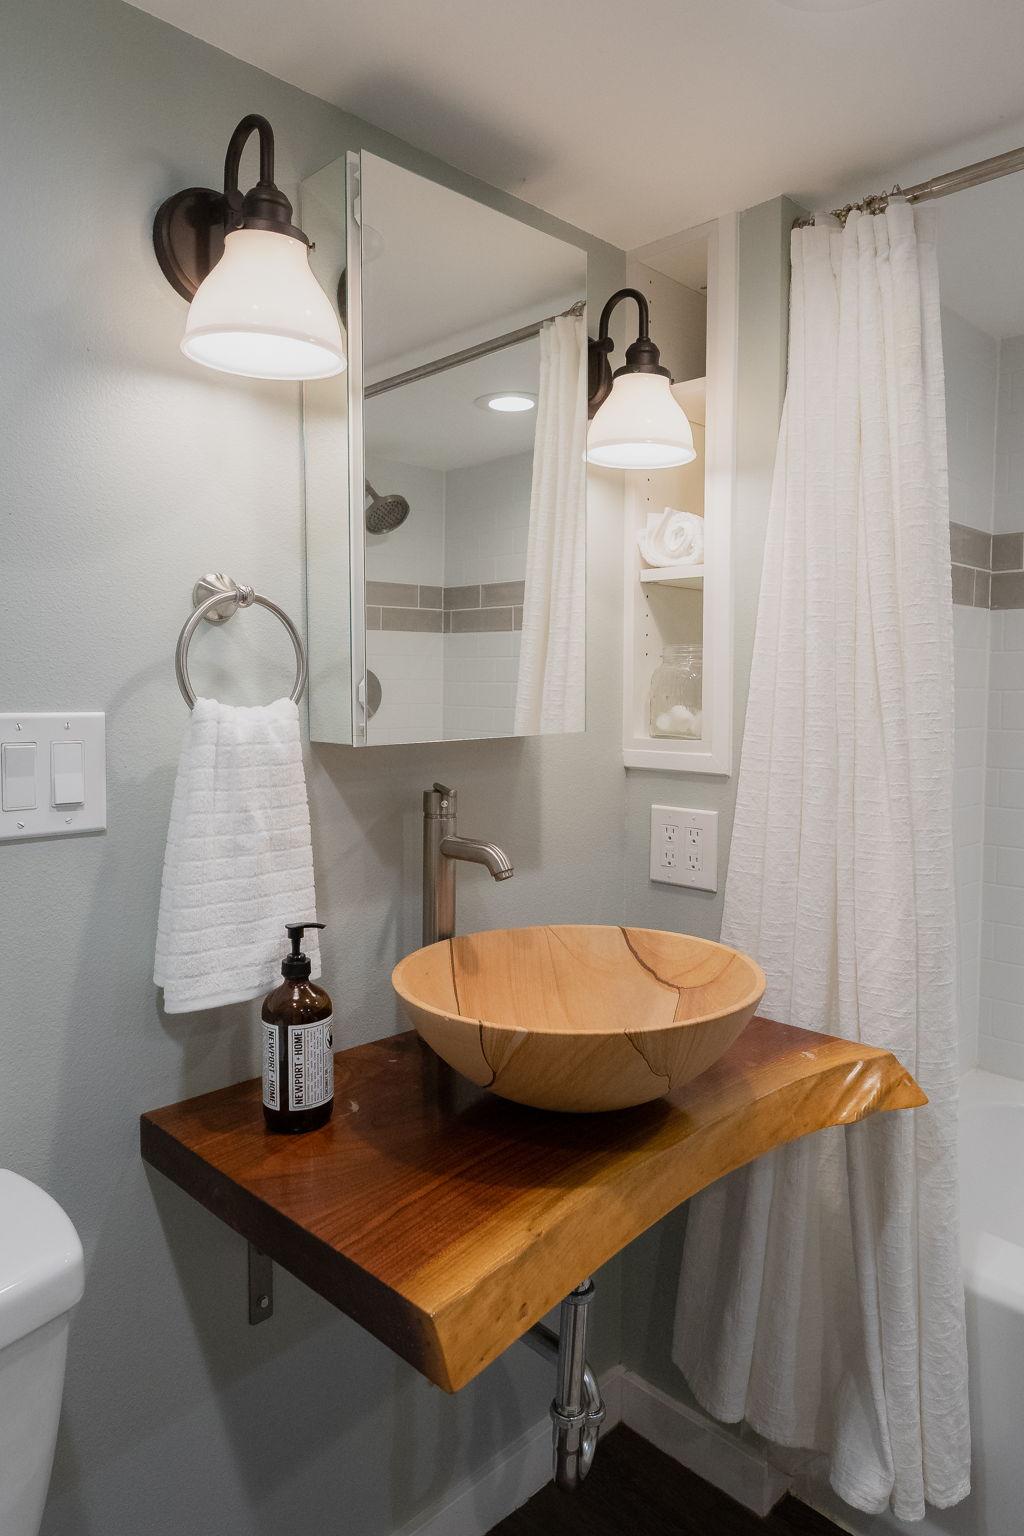 Custom handmade live edge vanity in primary bathroom.